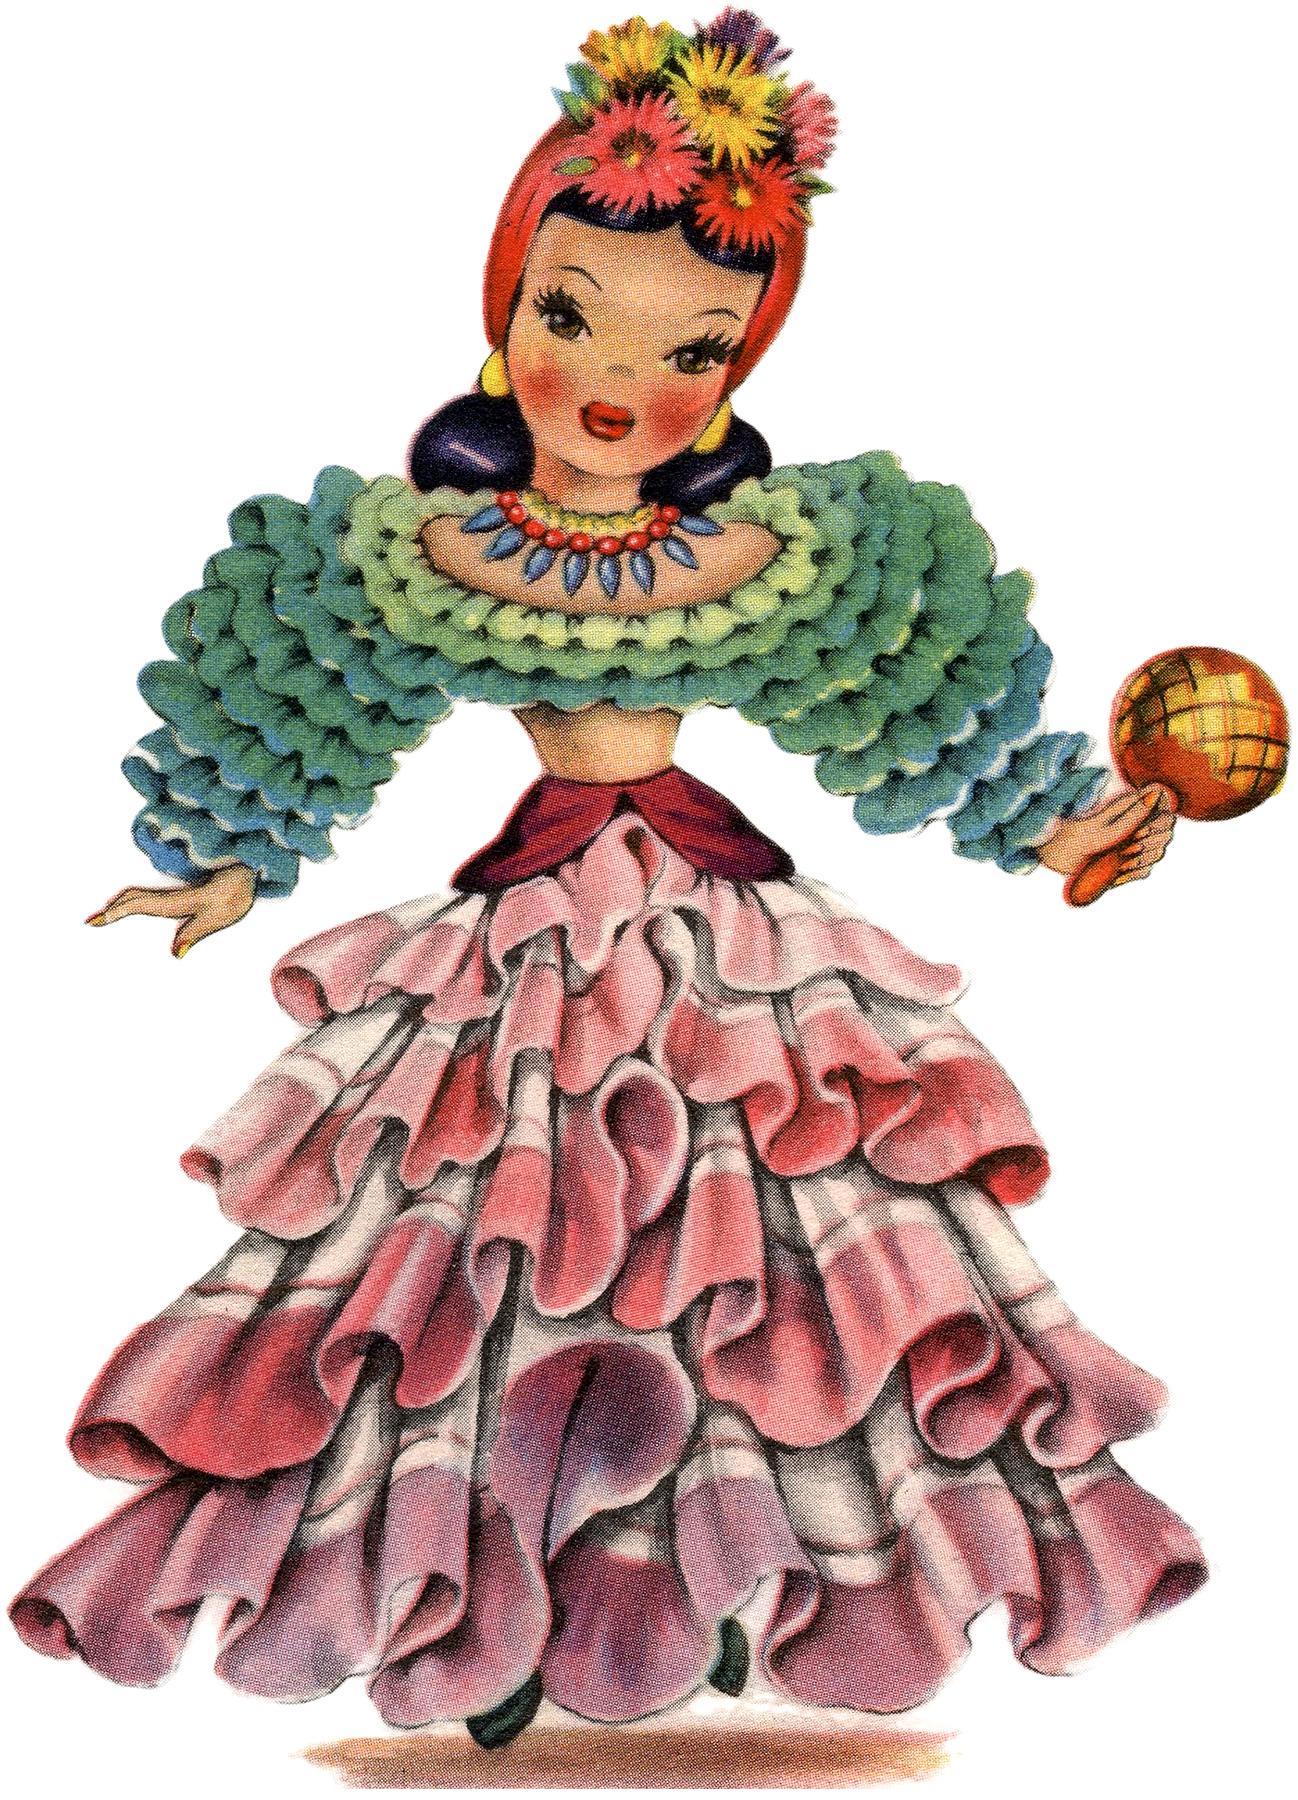 Retro Latin America Doll Image The Graphics Fairy